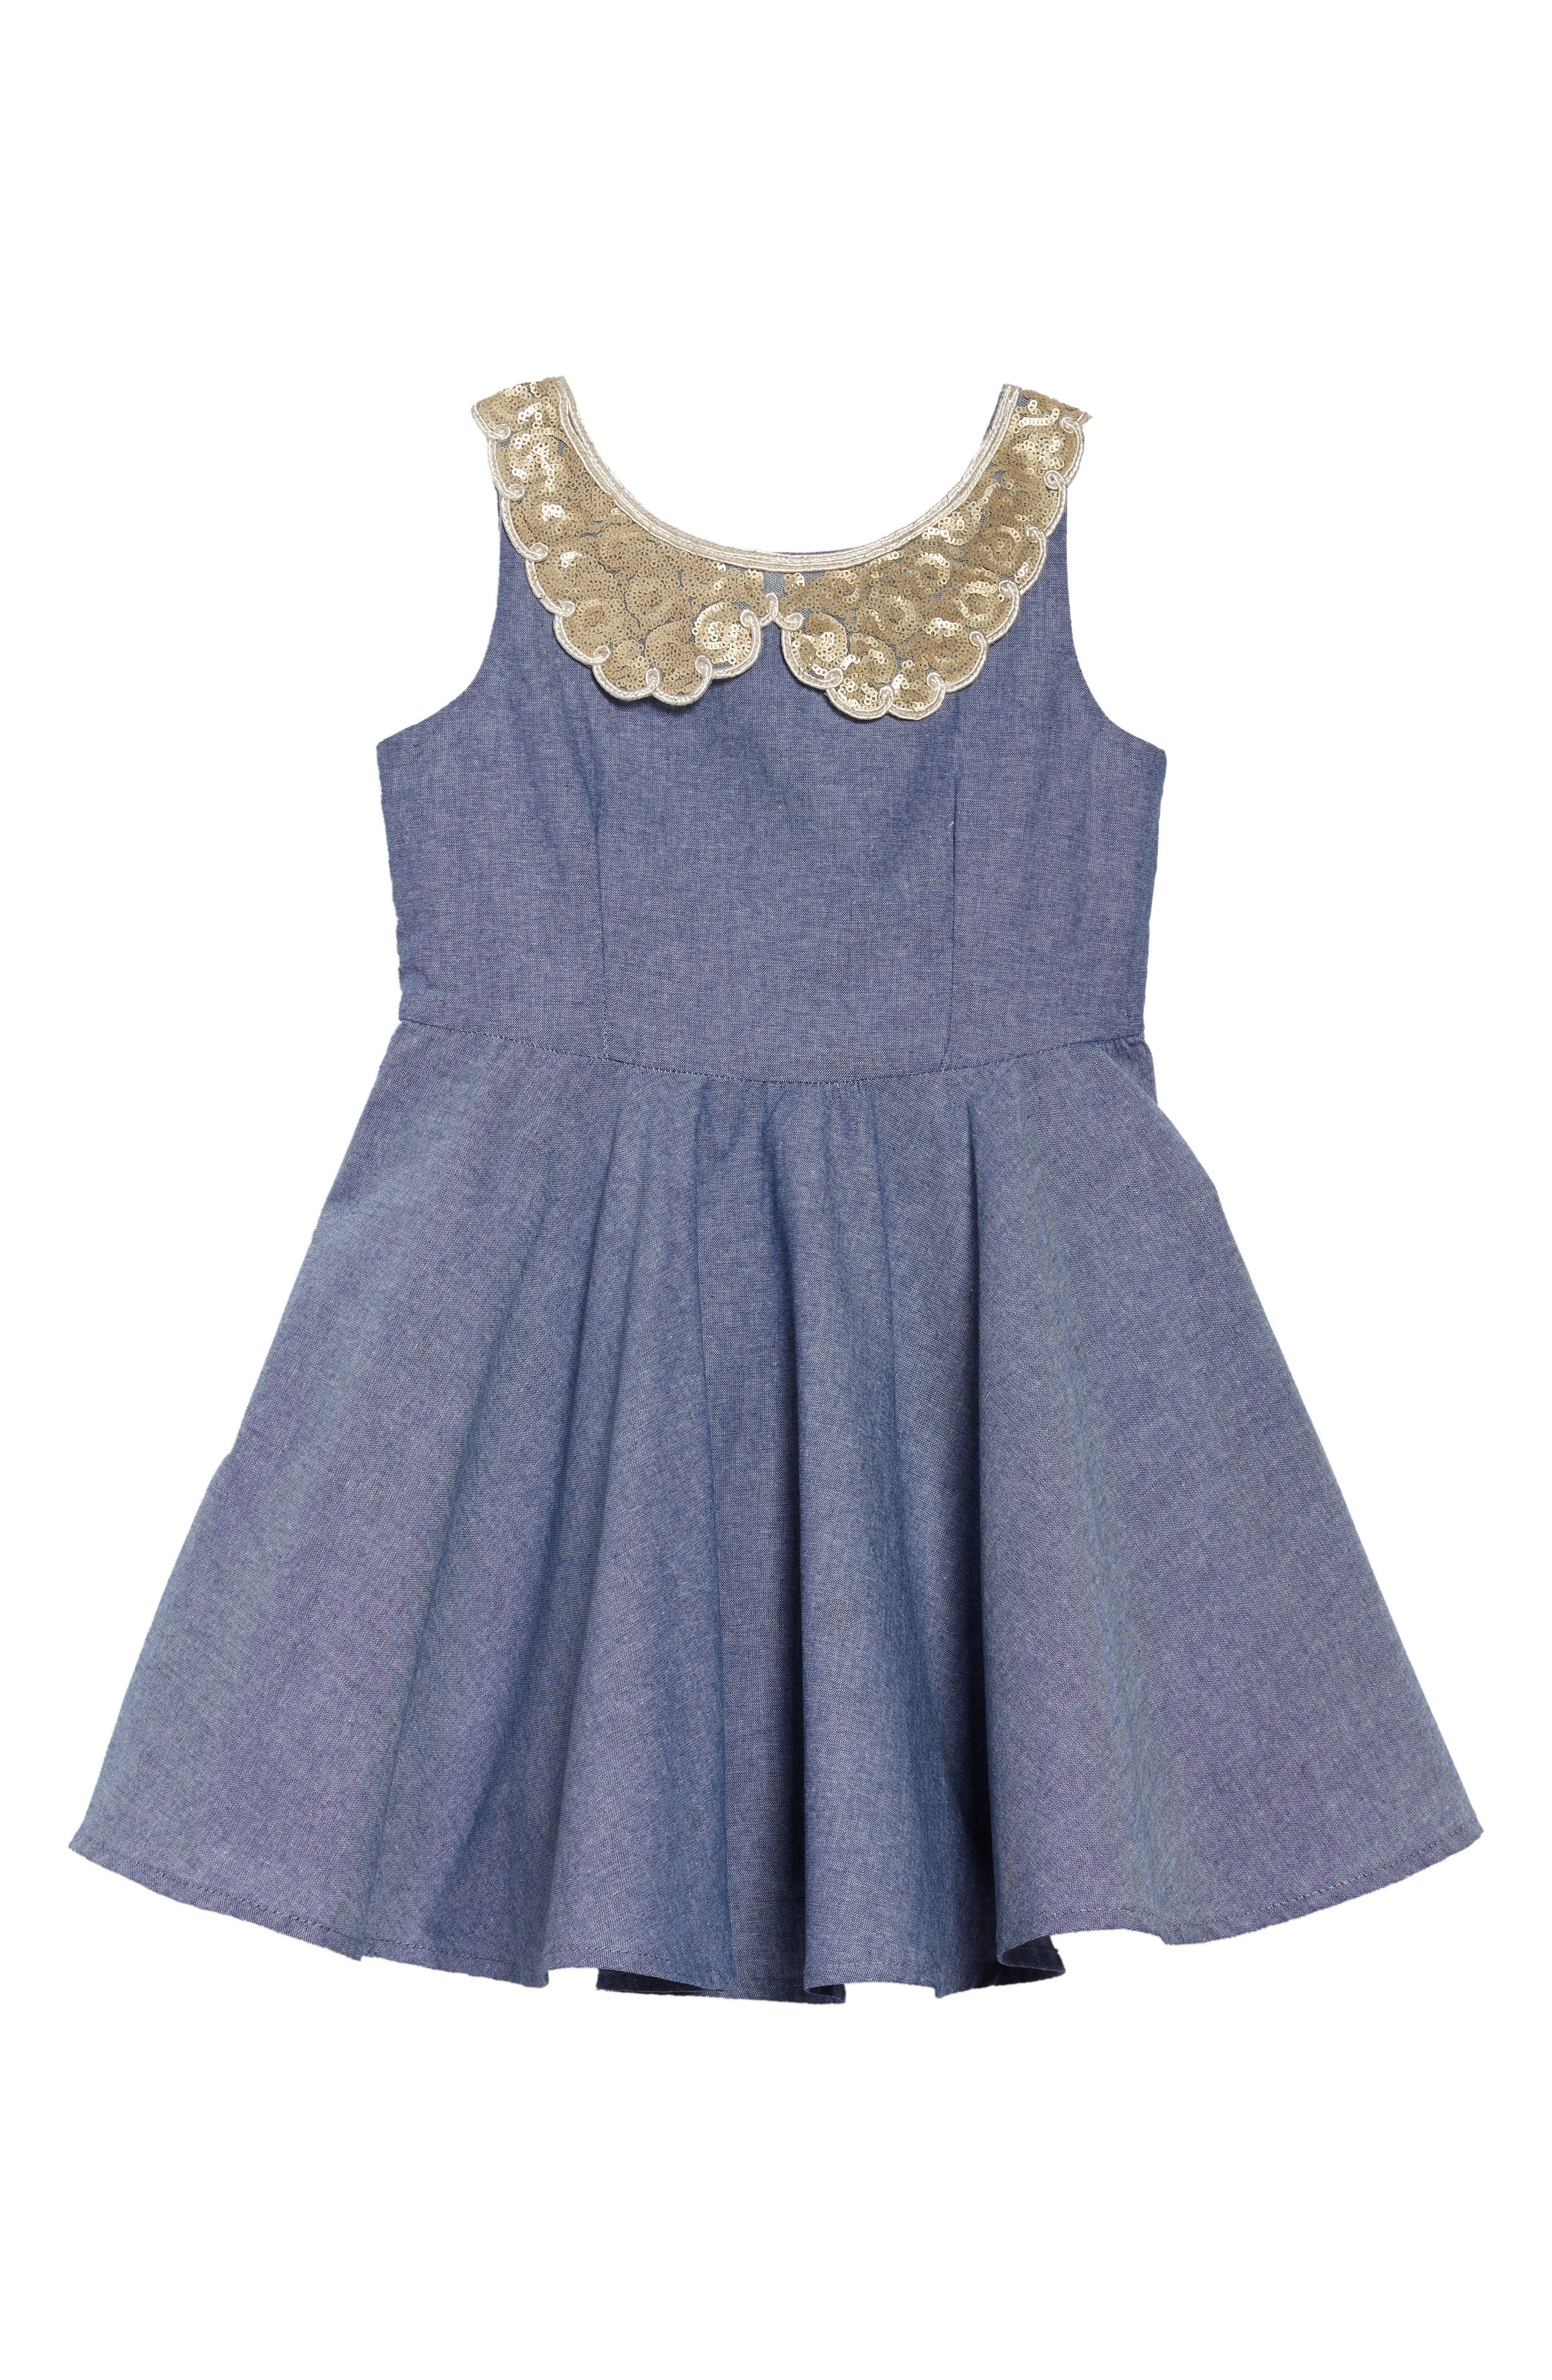 Darcy Chambray Dress,                         Main,                         color, Denim